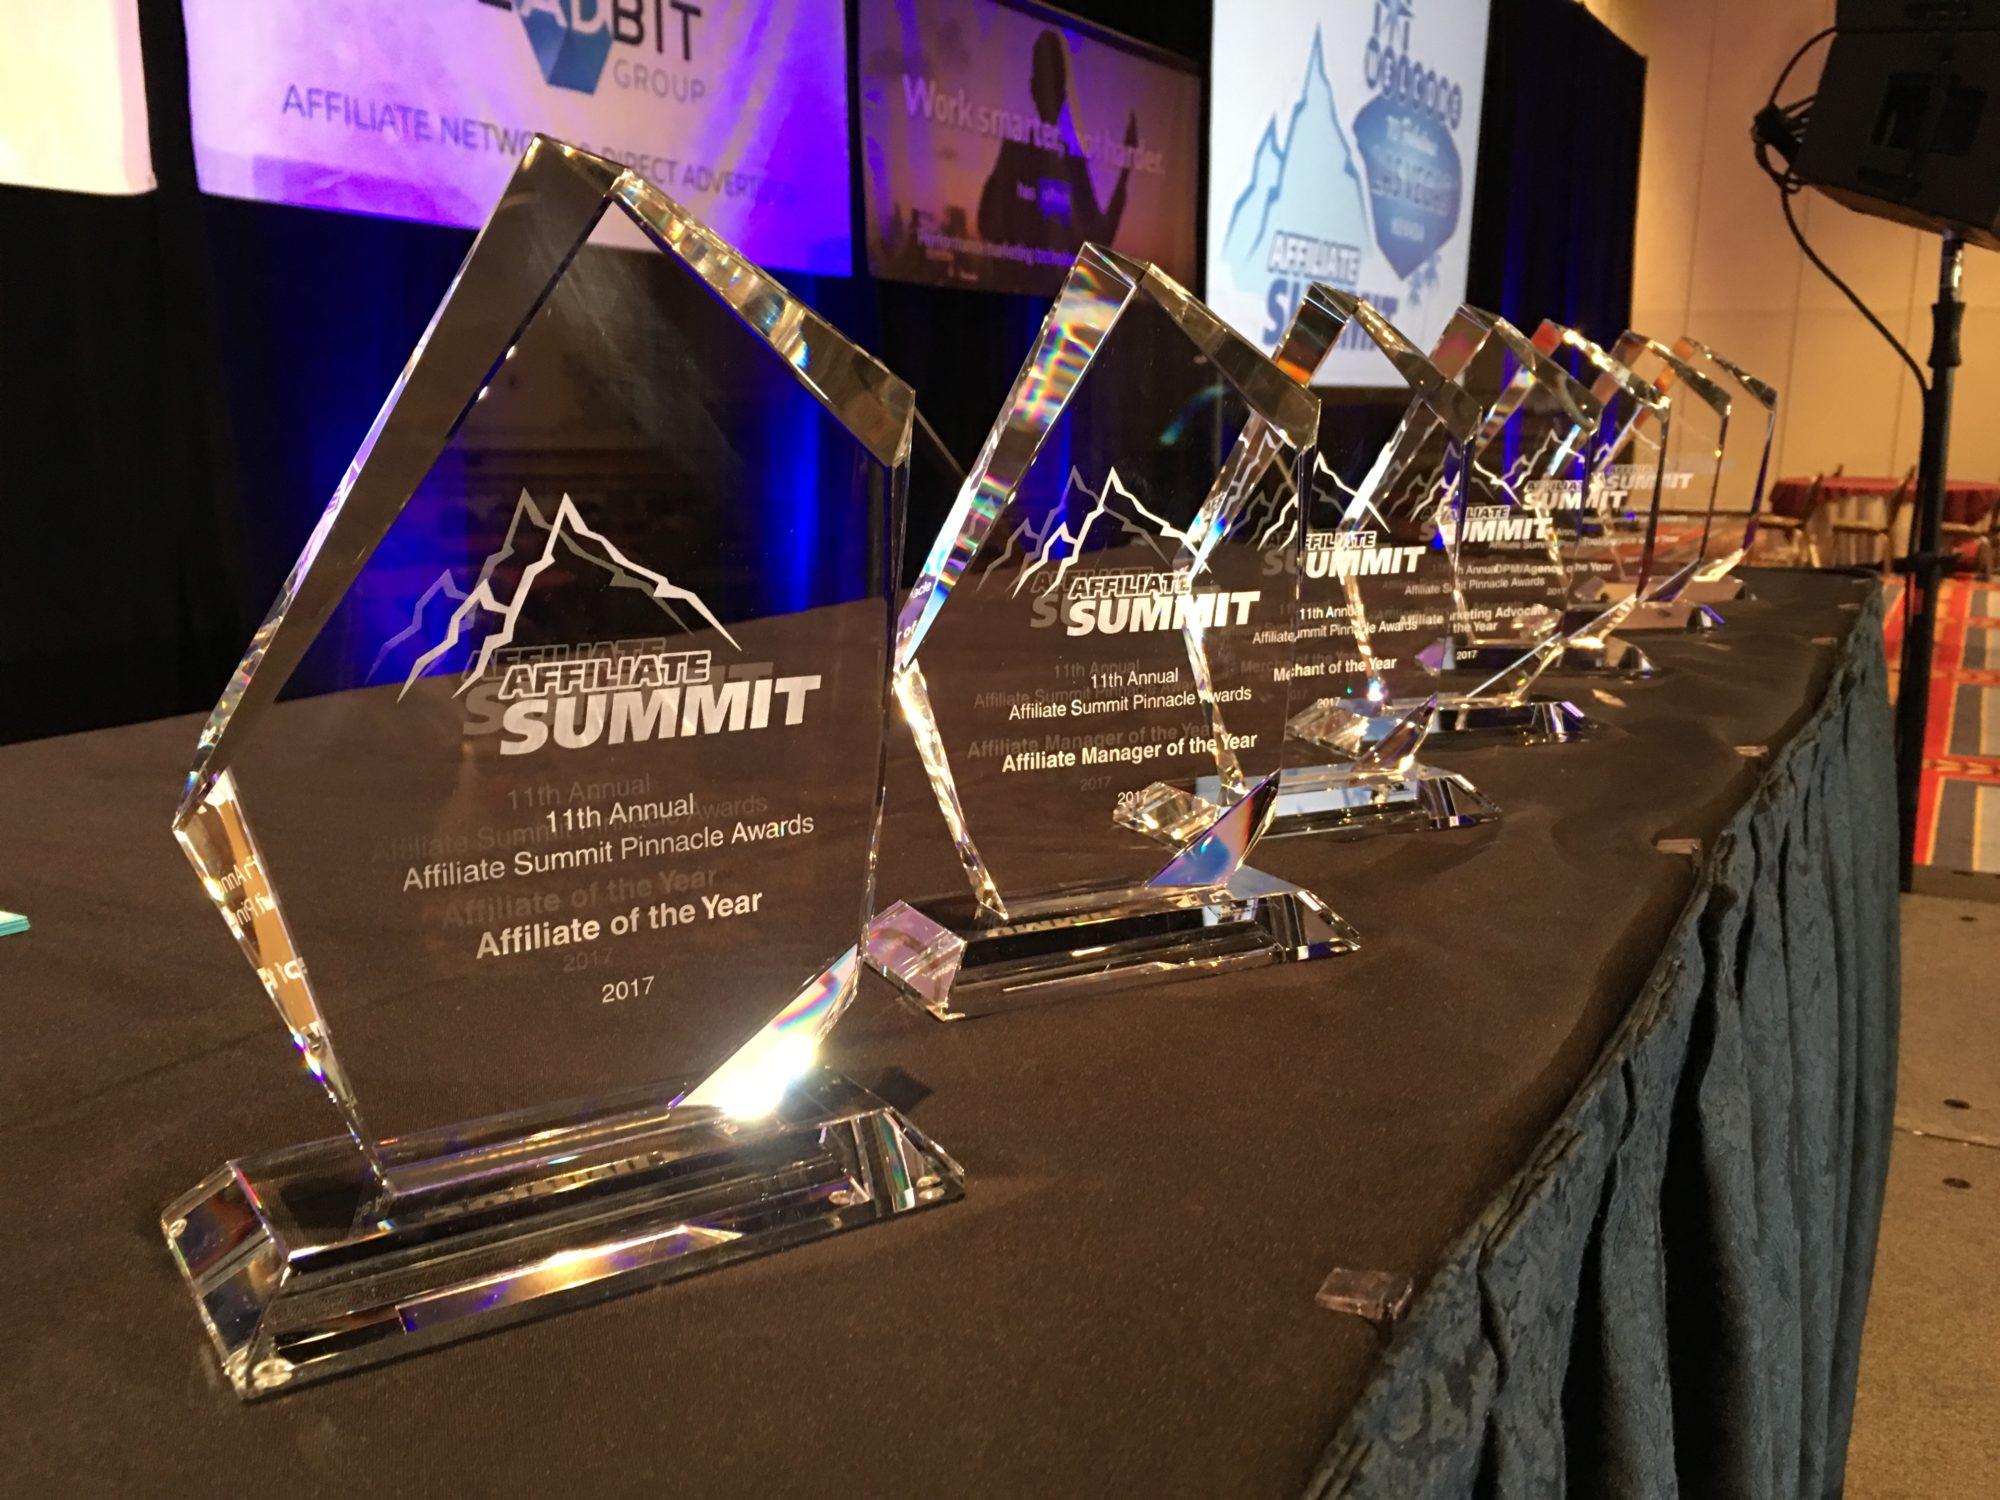 Affiliate Summit Pinnacle Awards